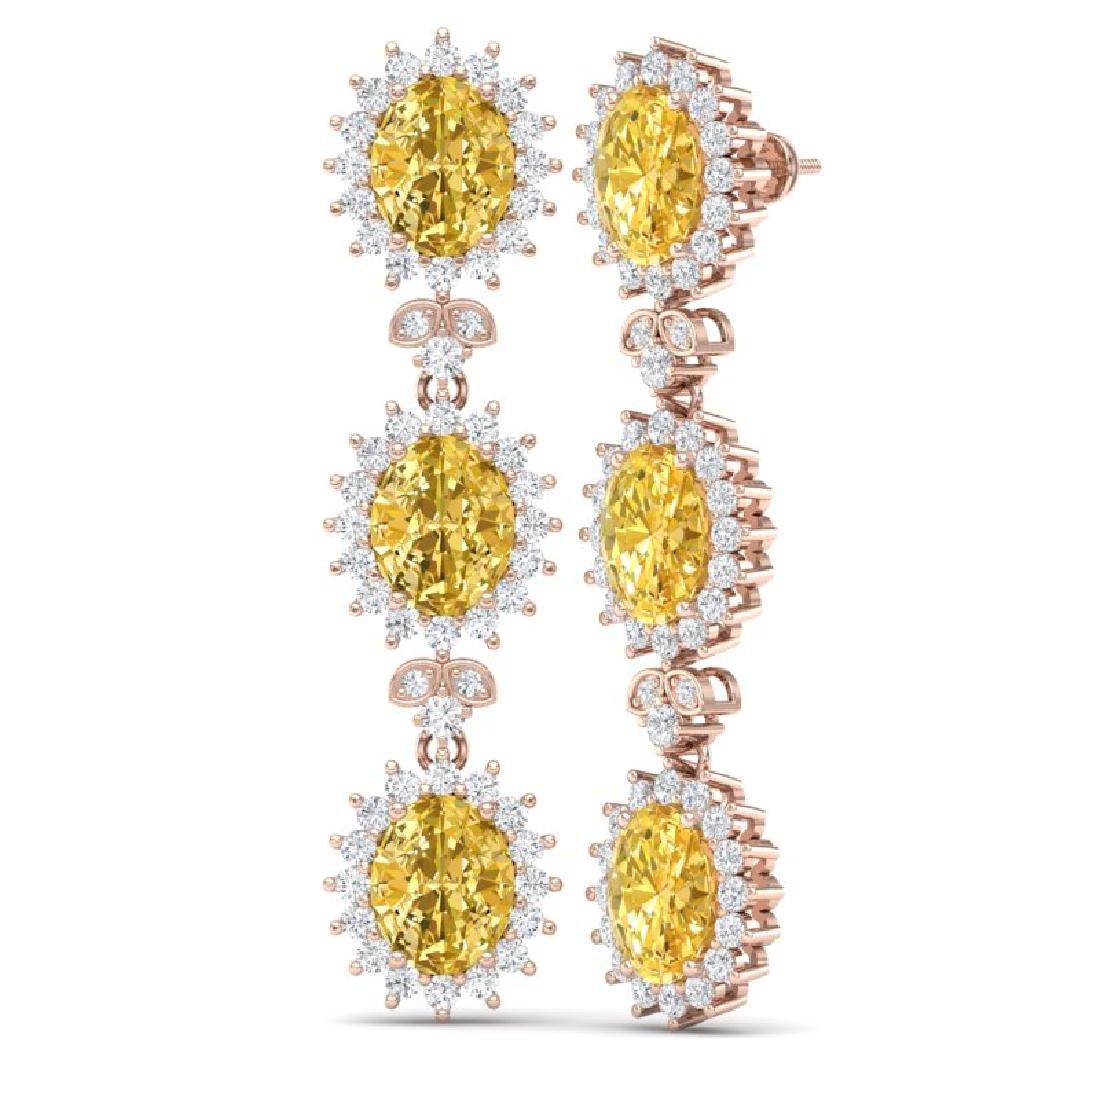 19.06 CTW Royalty Canary Citrine & VS Diamond Earrings - 3